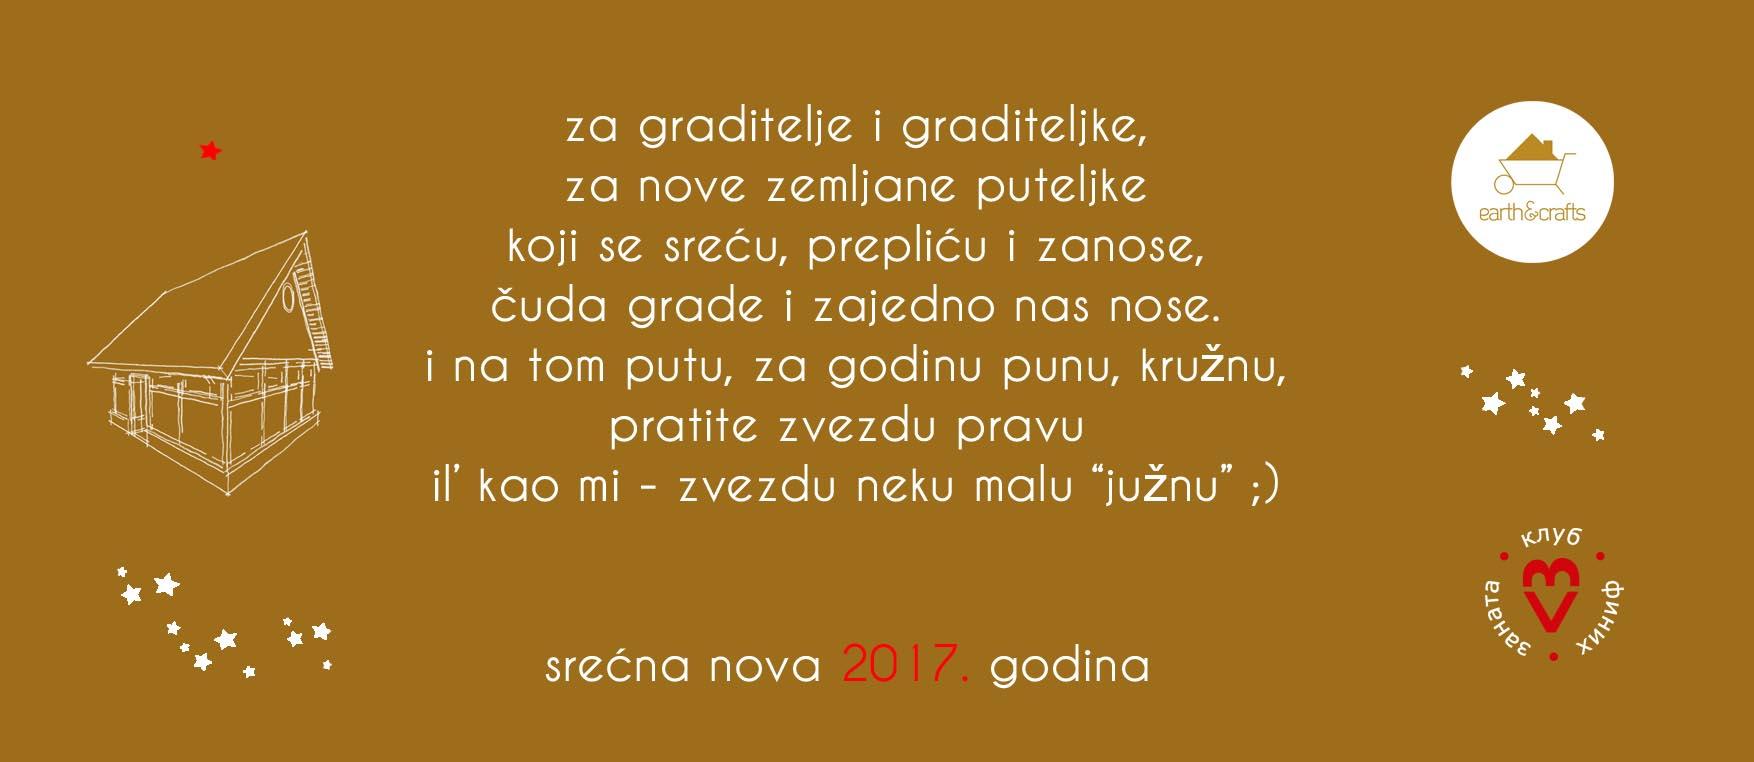 srecna-nova-2017-godina-s